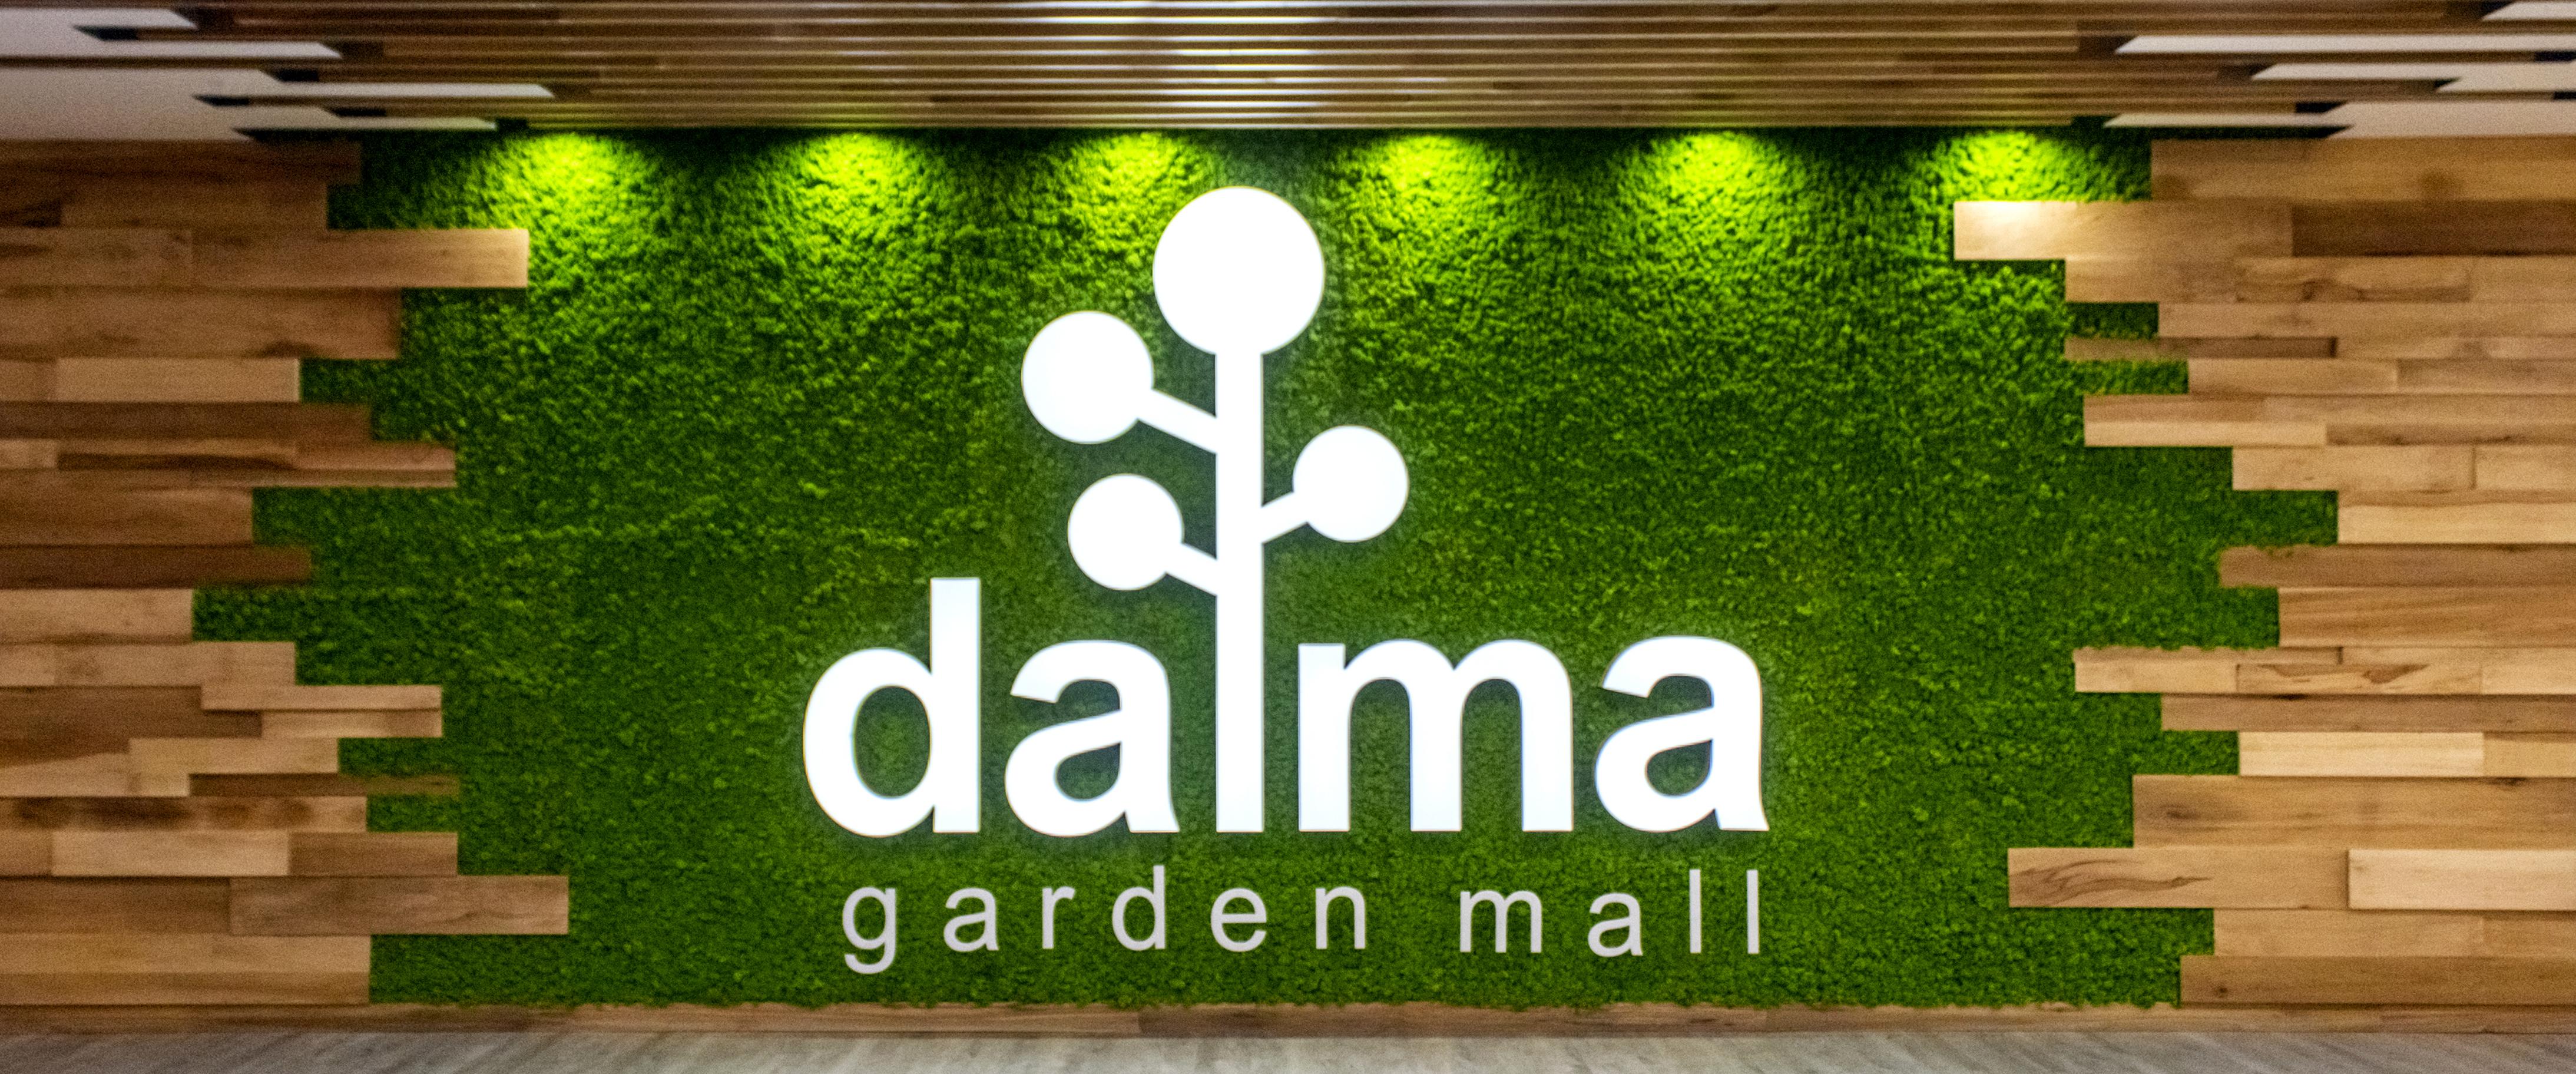 dalma (2) copy